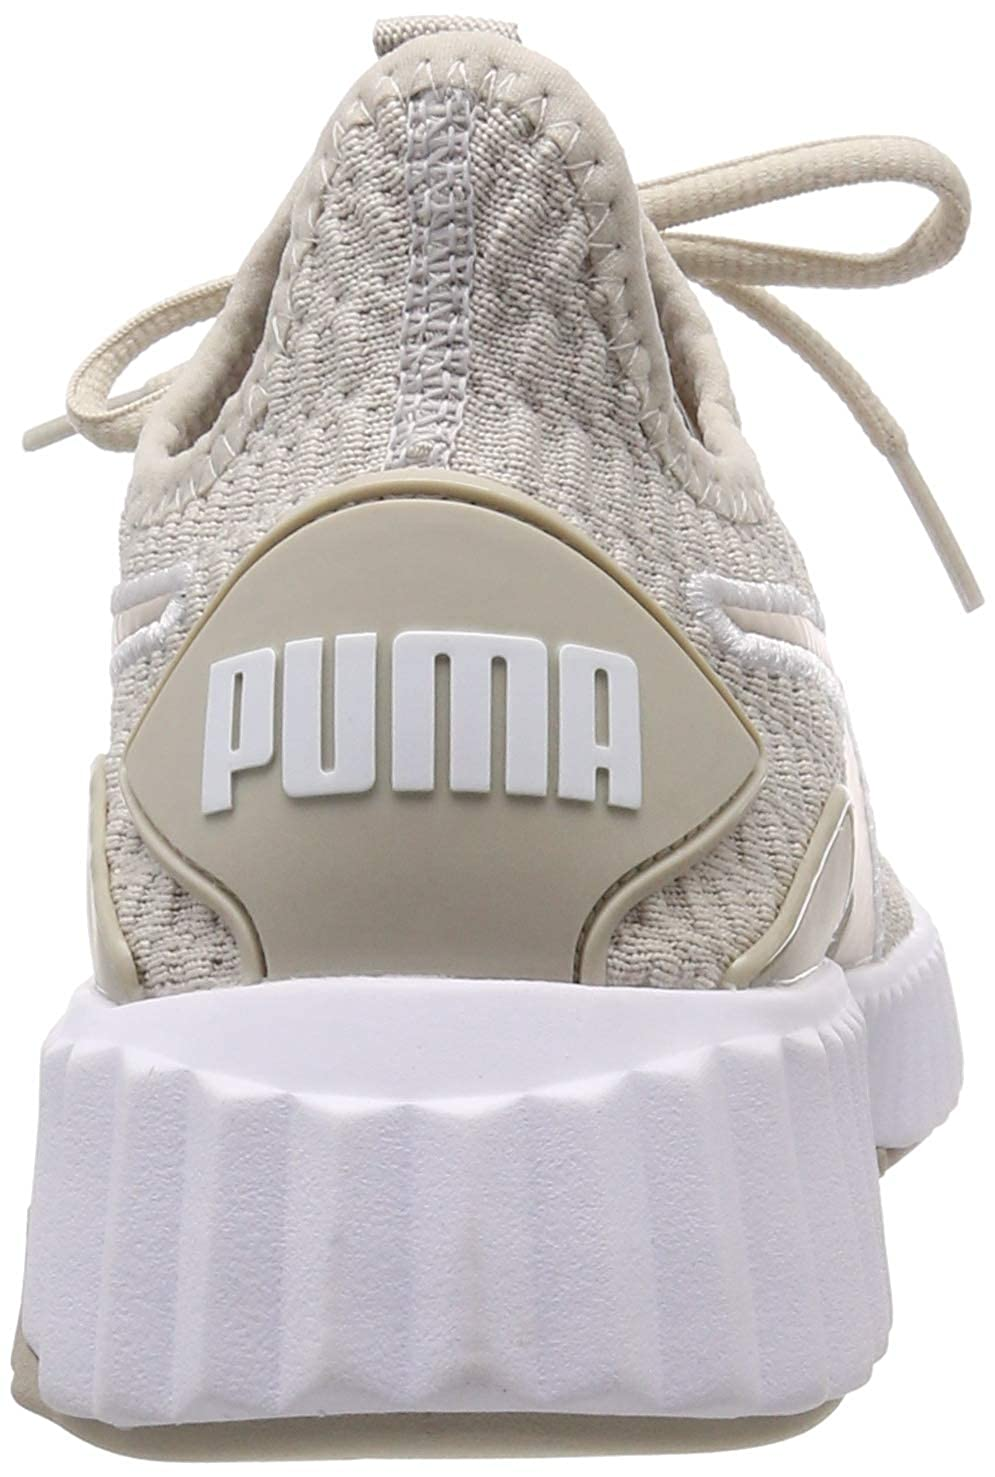 Puma Damen Damen Damen Defy WN's Fitnessschuhe  8905f4